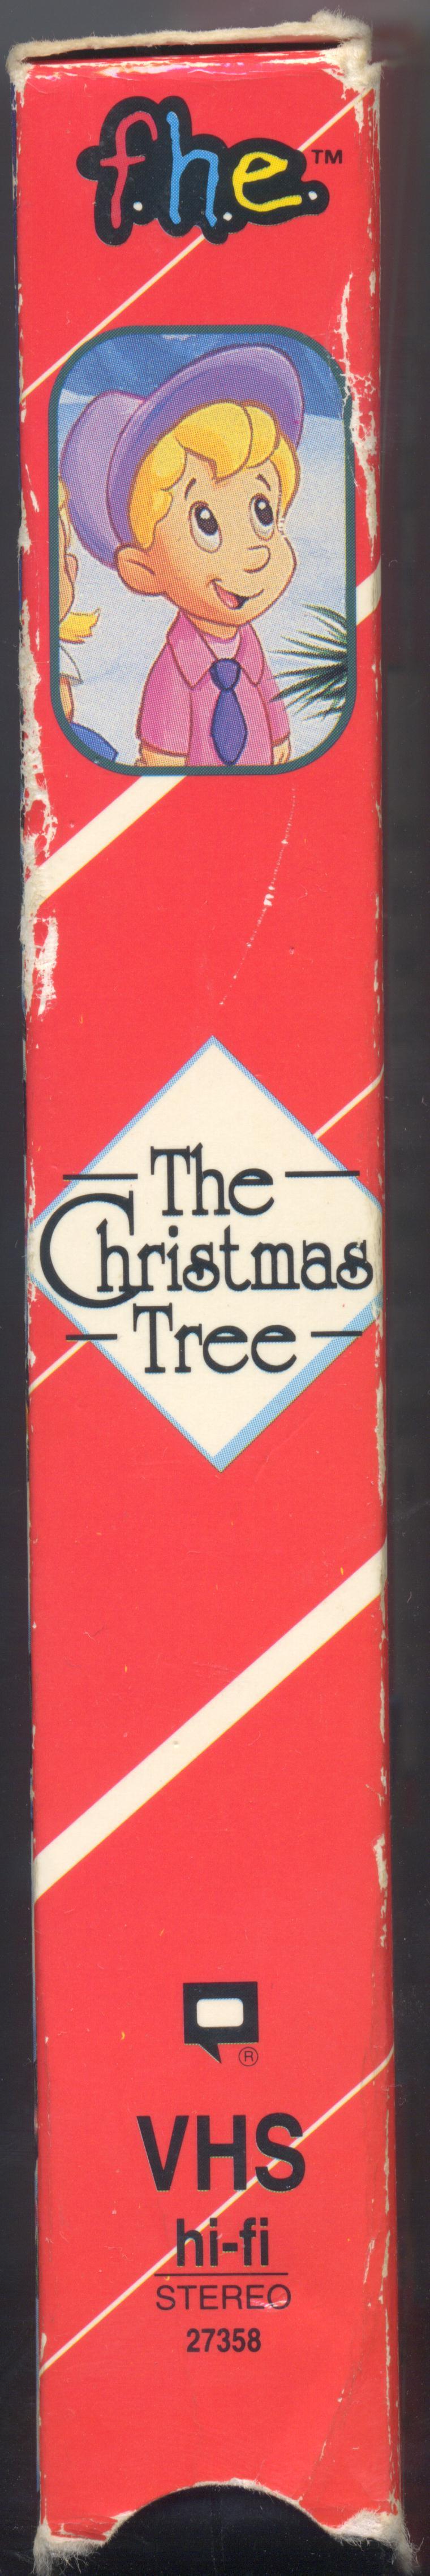 The Christmas Tree 1991.The Christmas Tree Vhscollector Com